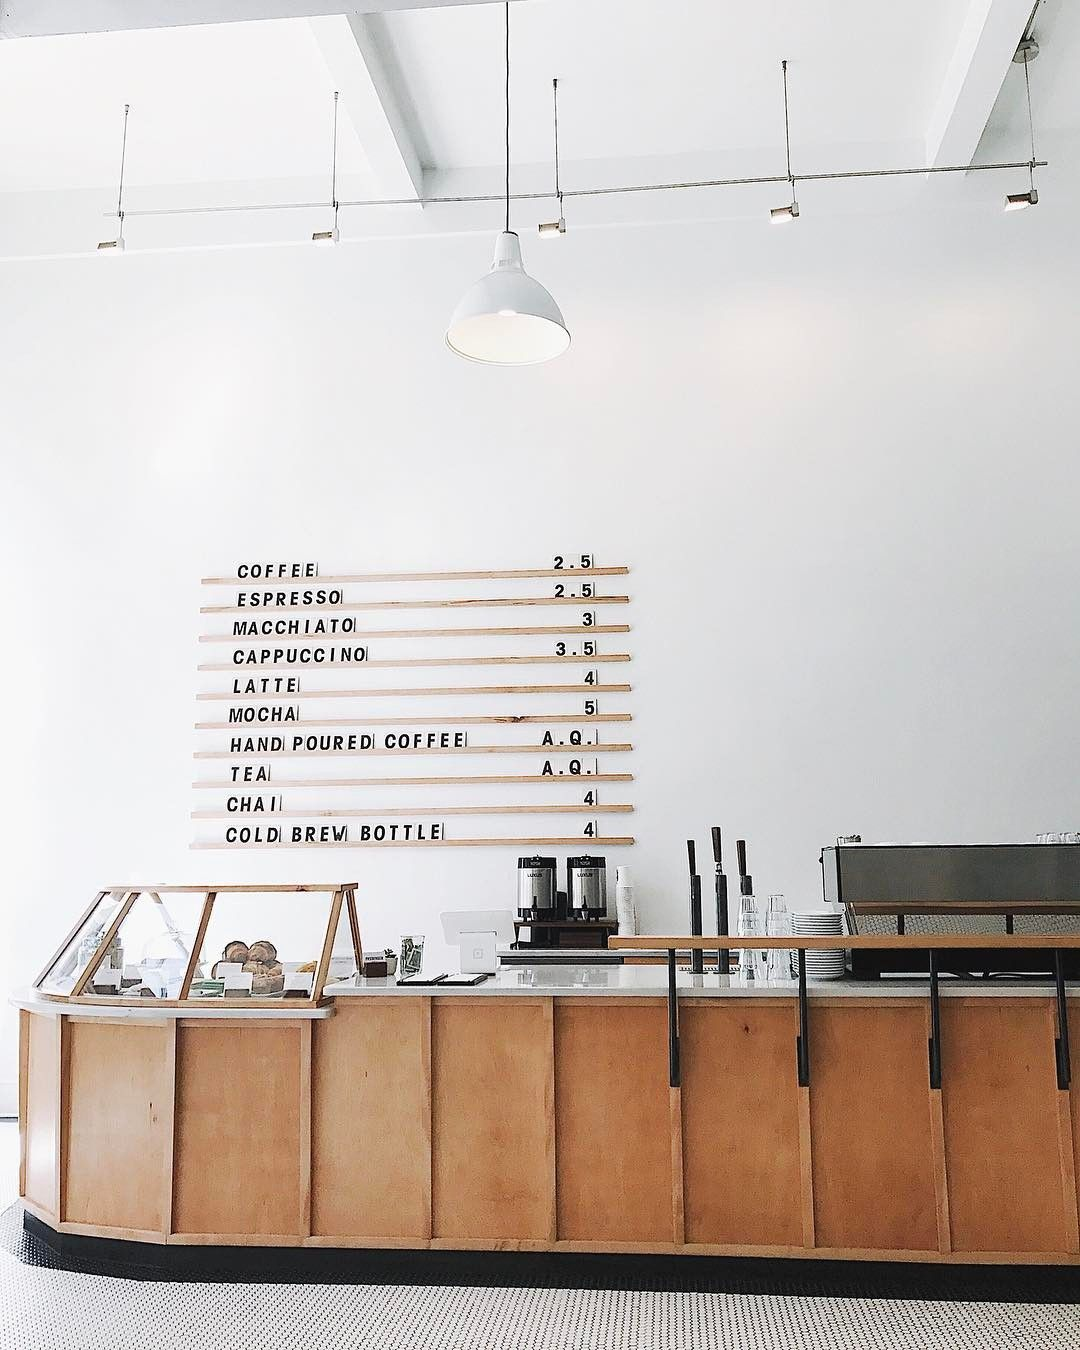 Coffee Shop Menu Board Pastry Display Countertops And Penny Tile Coffee Shop Menu Board Coffee Shop Menu Coffee Shop